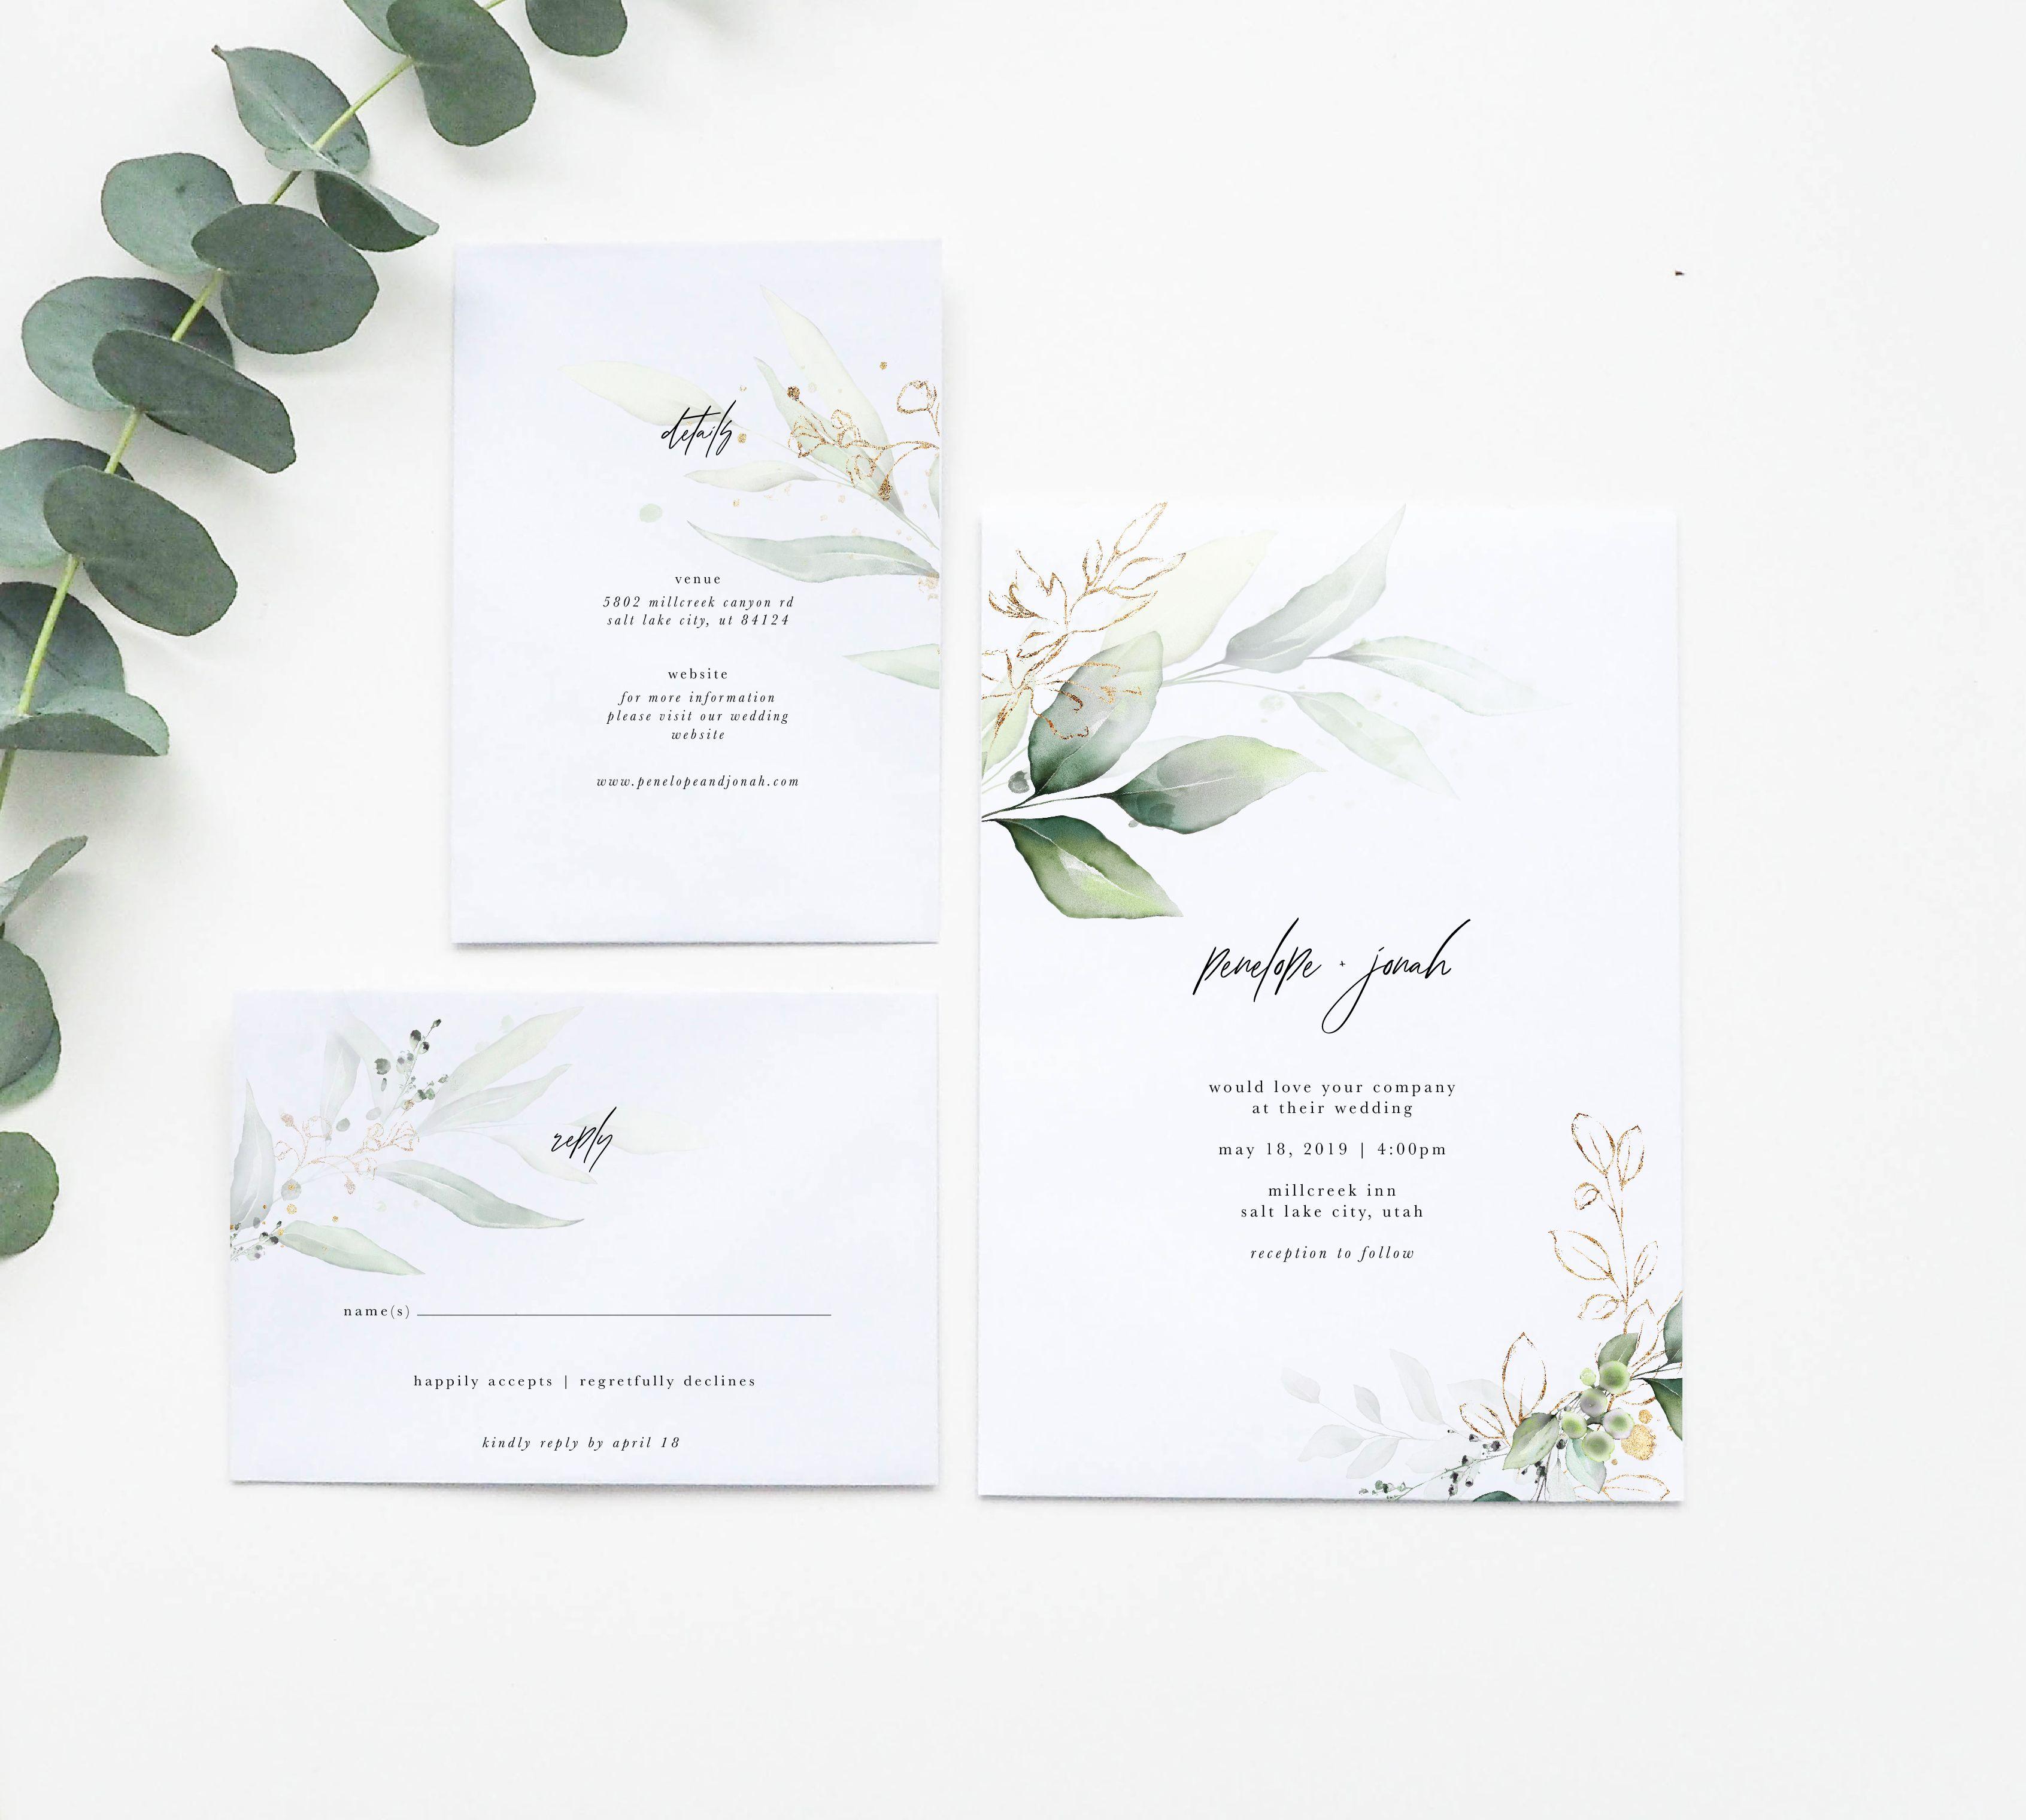 Simple Wedding Invitation Greenery Wedding Invitation Wedding Invitation Greenery Wedding Invitations Etsy Wedding Invitations Minimal Wedding Invitation